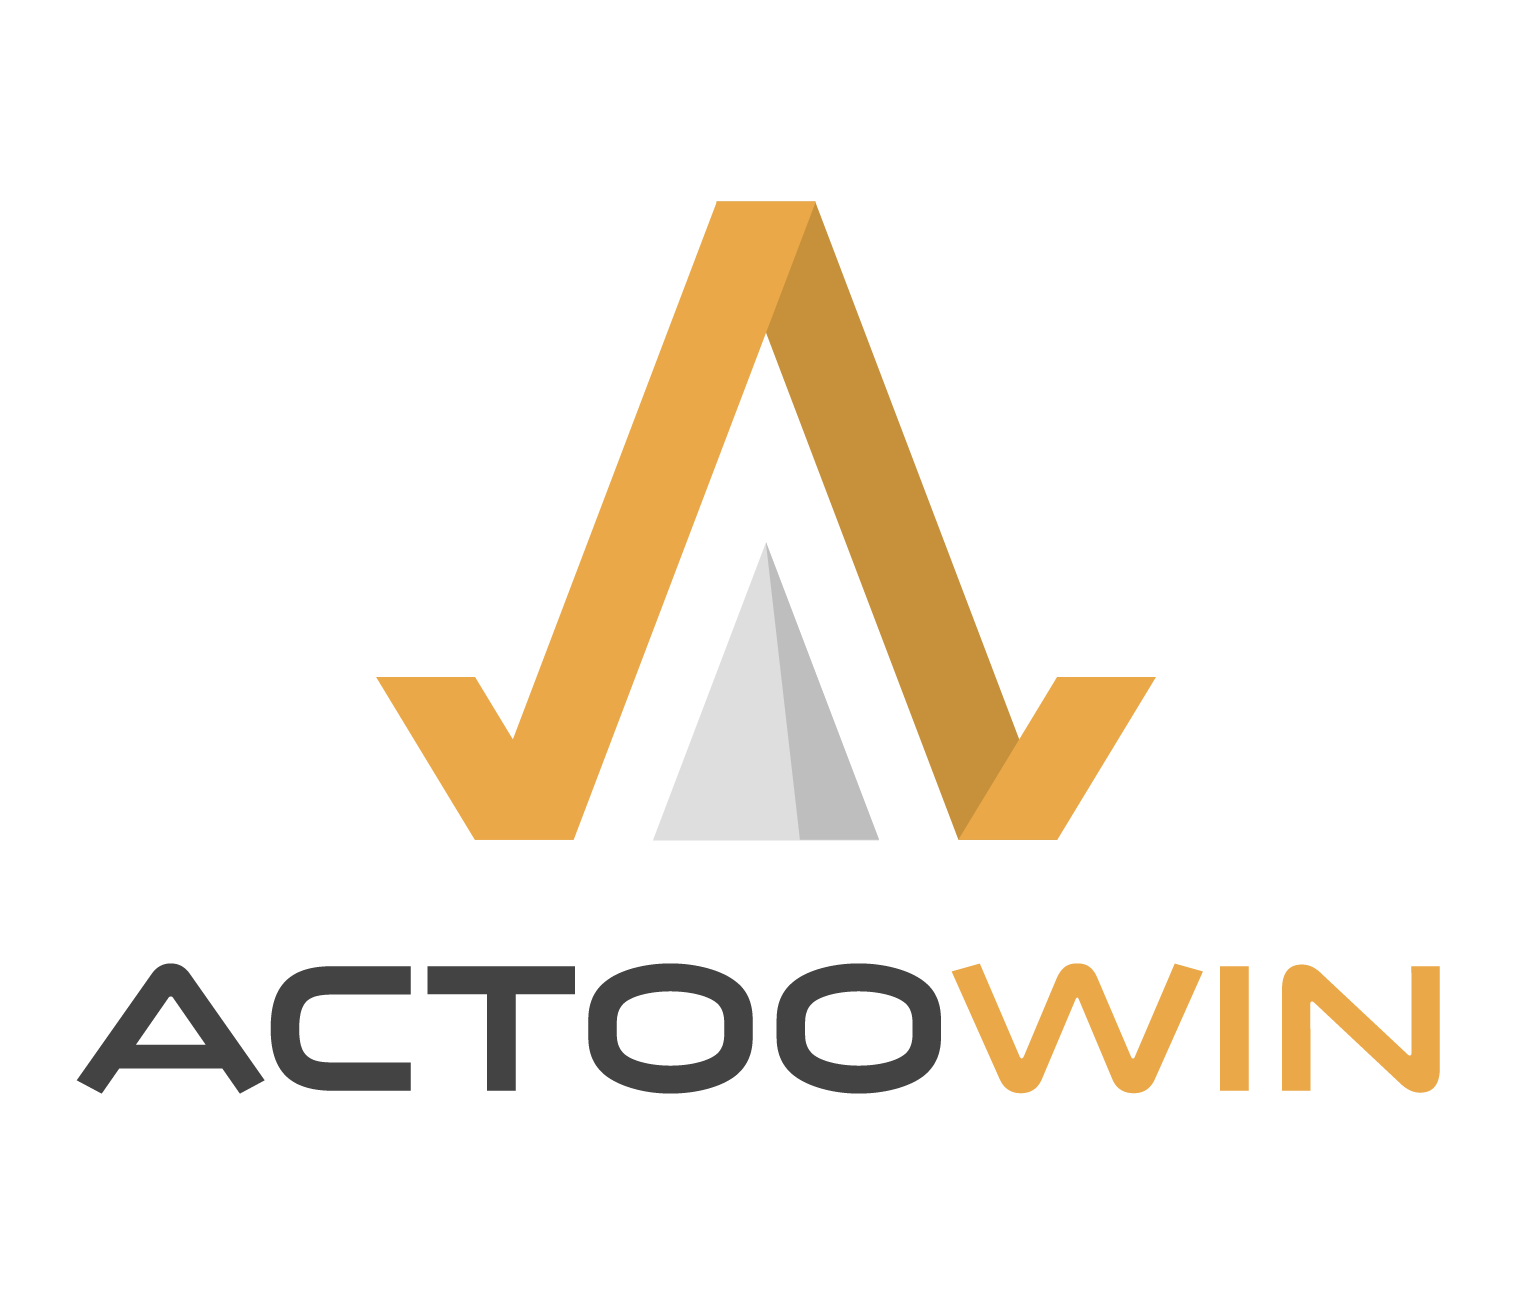 actoowin logo